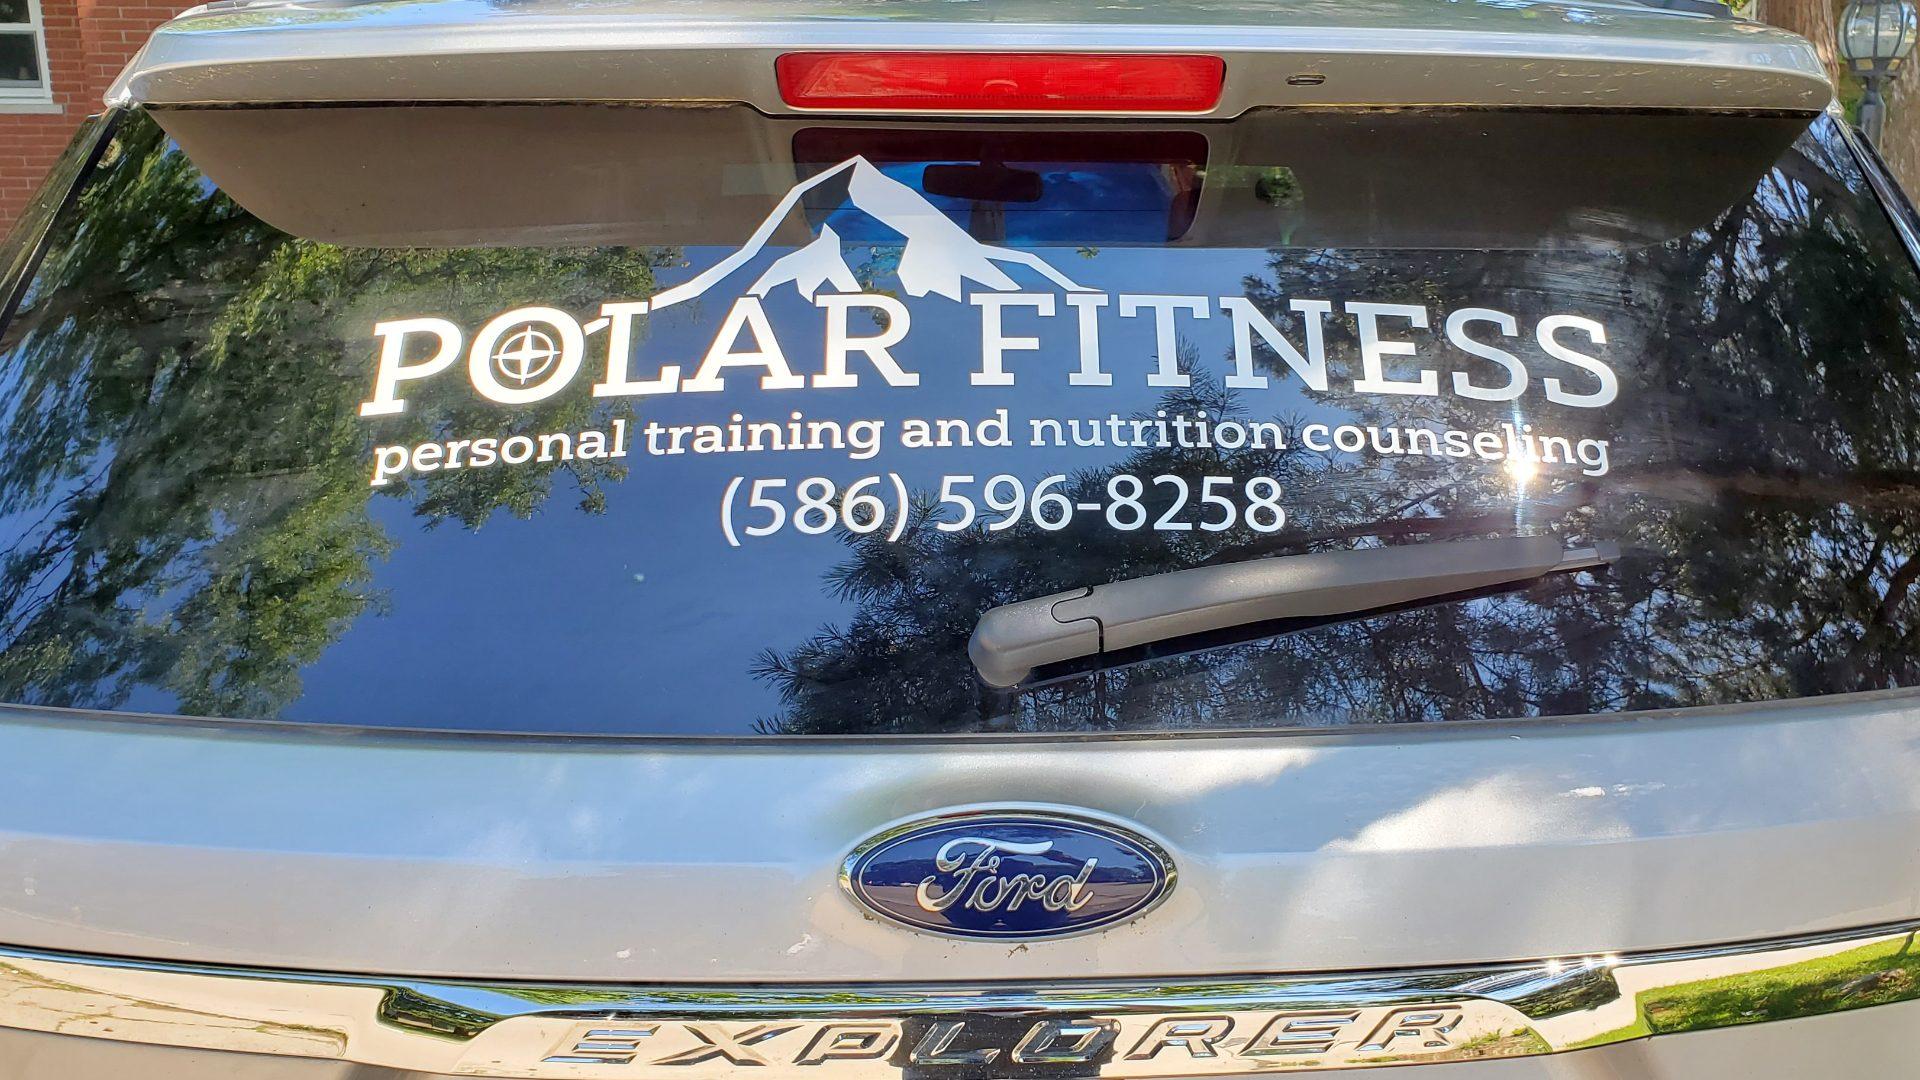 Polar Fitness - Ford Explorer Window Graphics 03